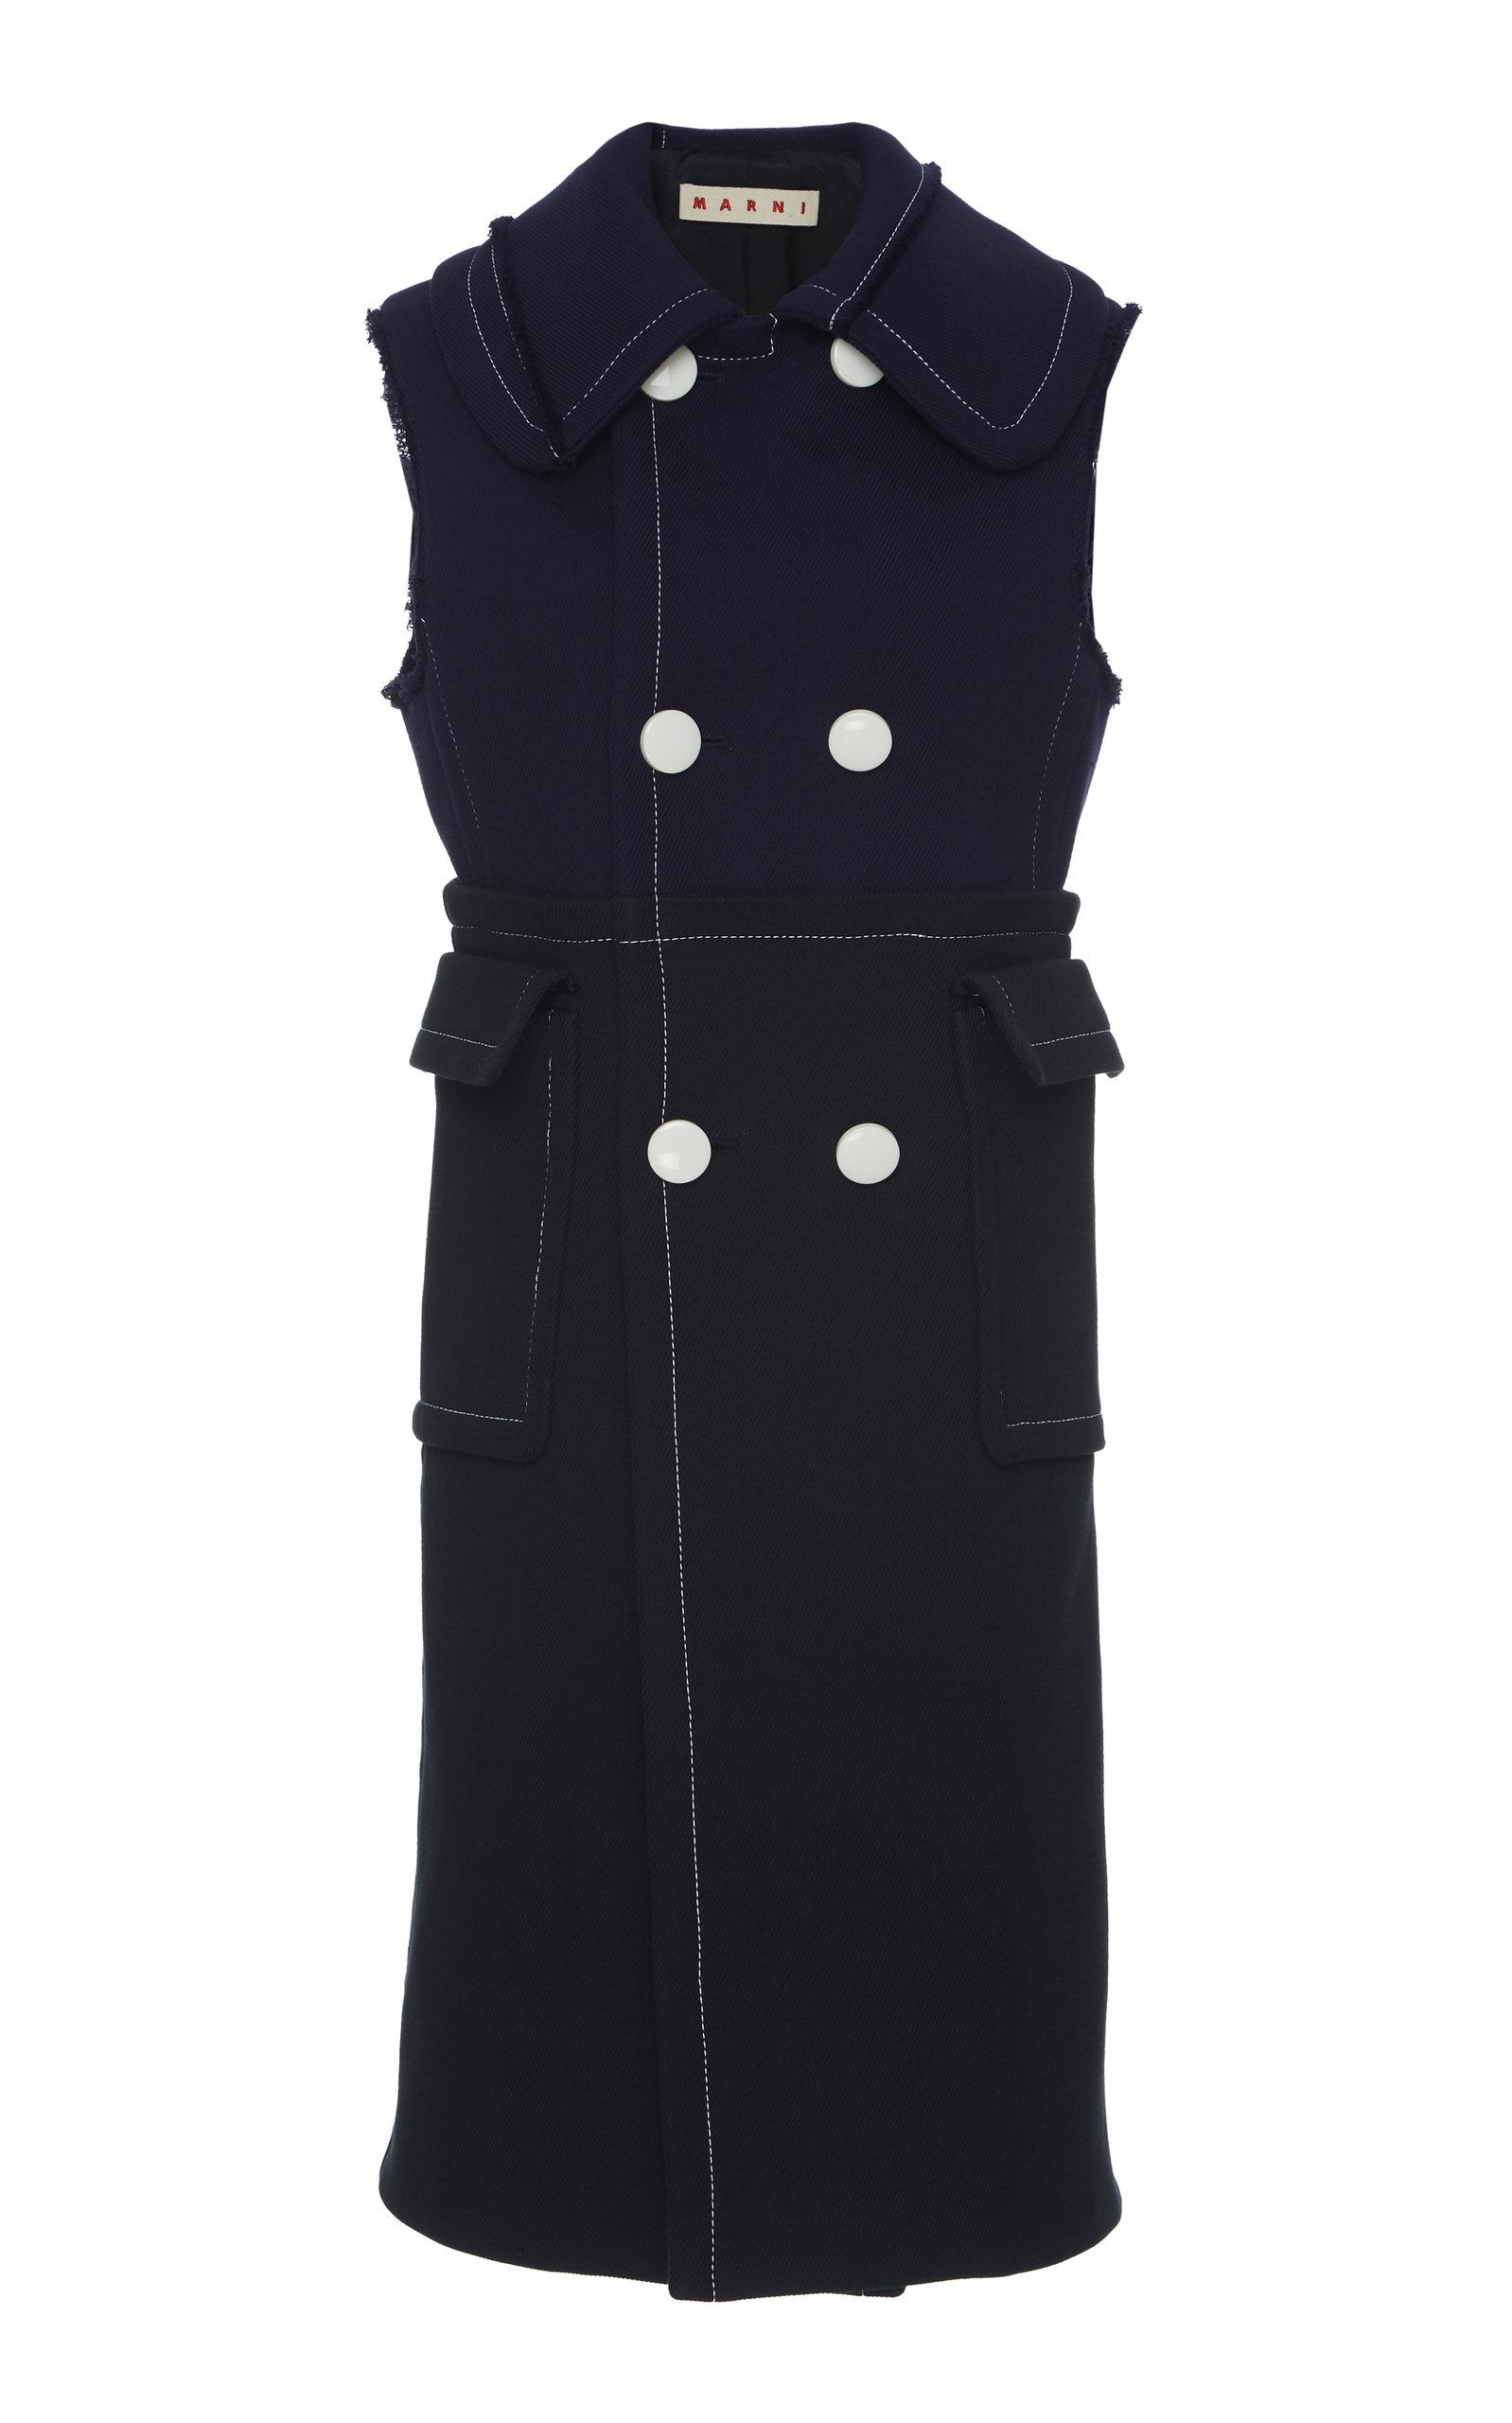 Woven Cotton Waistcoat Dress in Navy